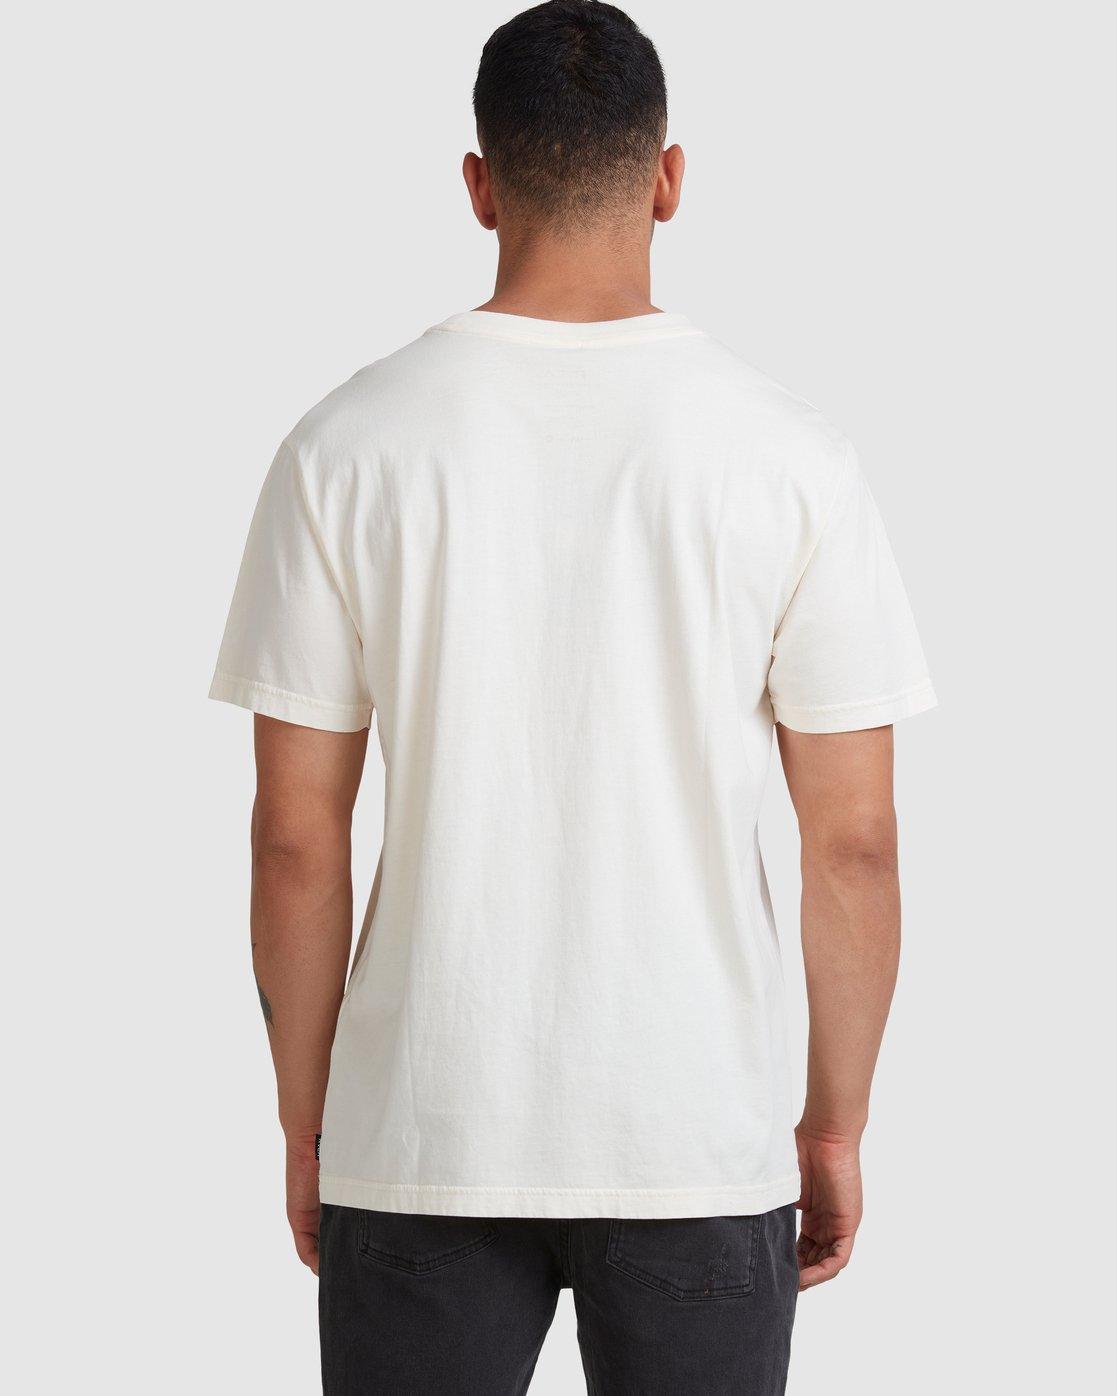 1 Death Valley Tee - T-shirt pour Homme  W1SSSJRVP1 RVCA